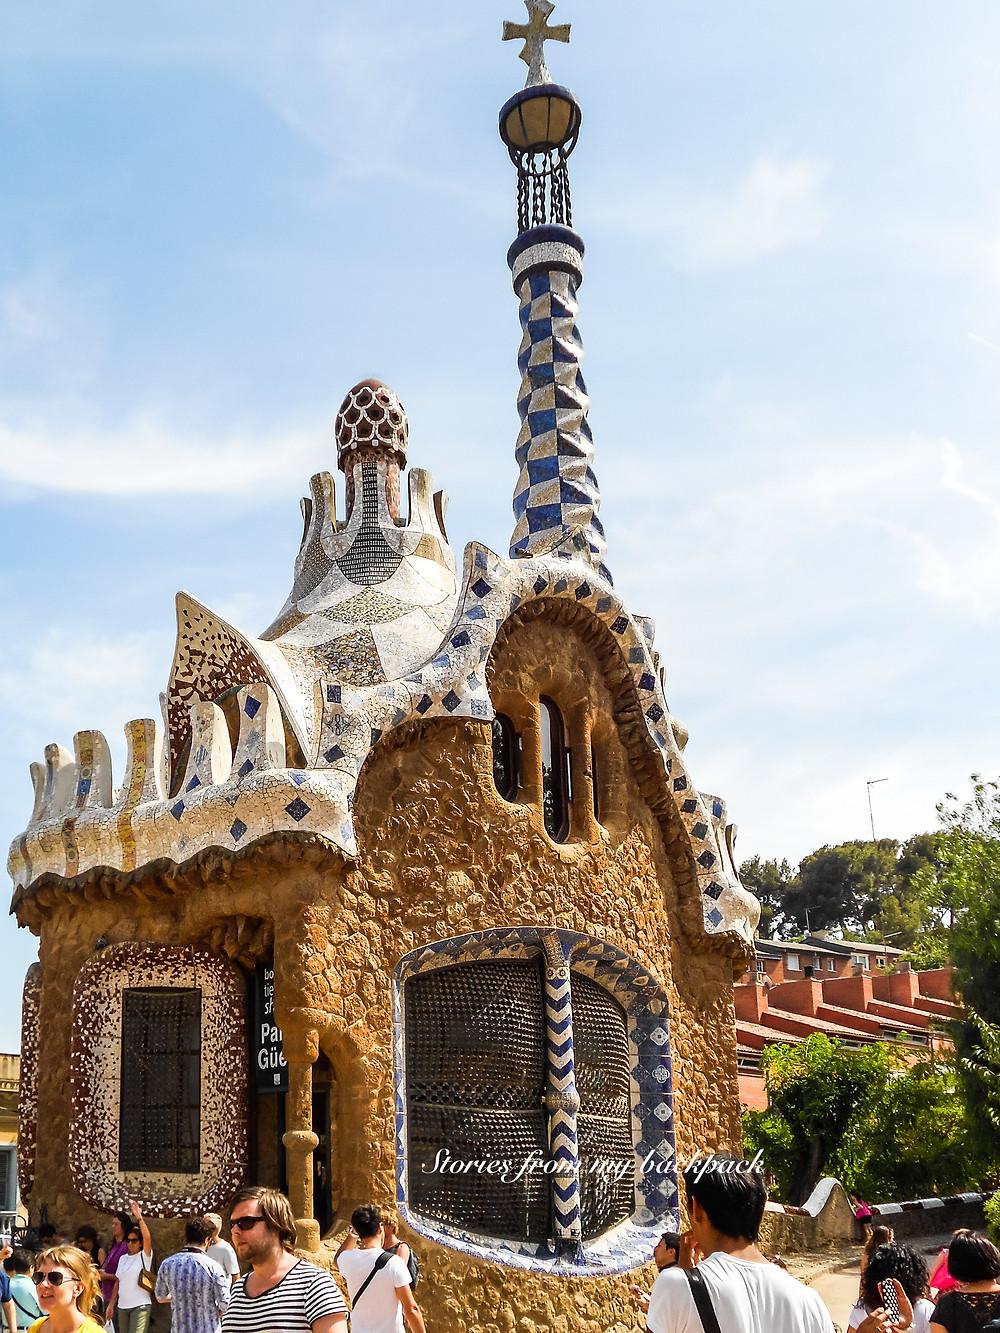 Park Guell, Gaudi Barcelona, Barcelona sightseeing, Barcelona on a budget, Barcelona city pass, Barcelona card